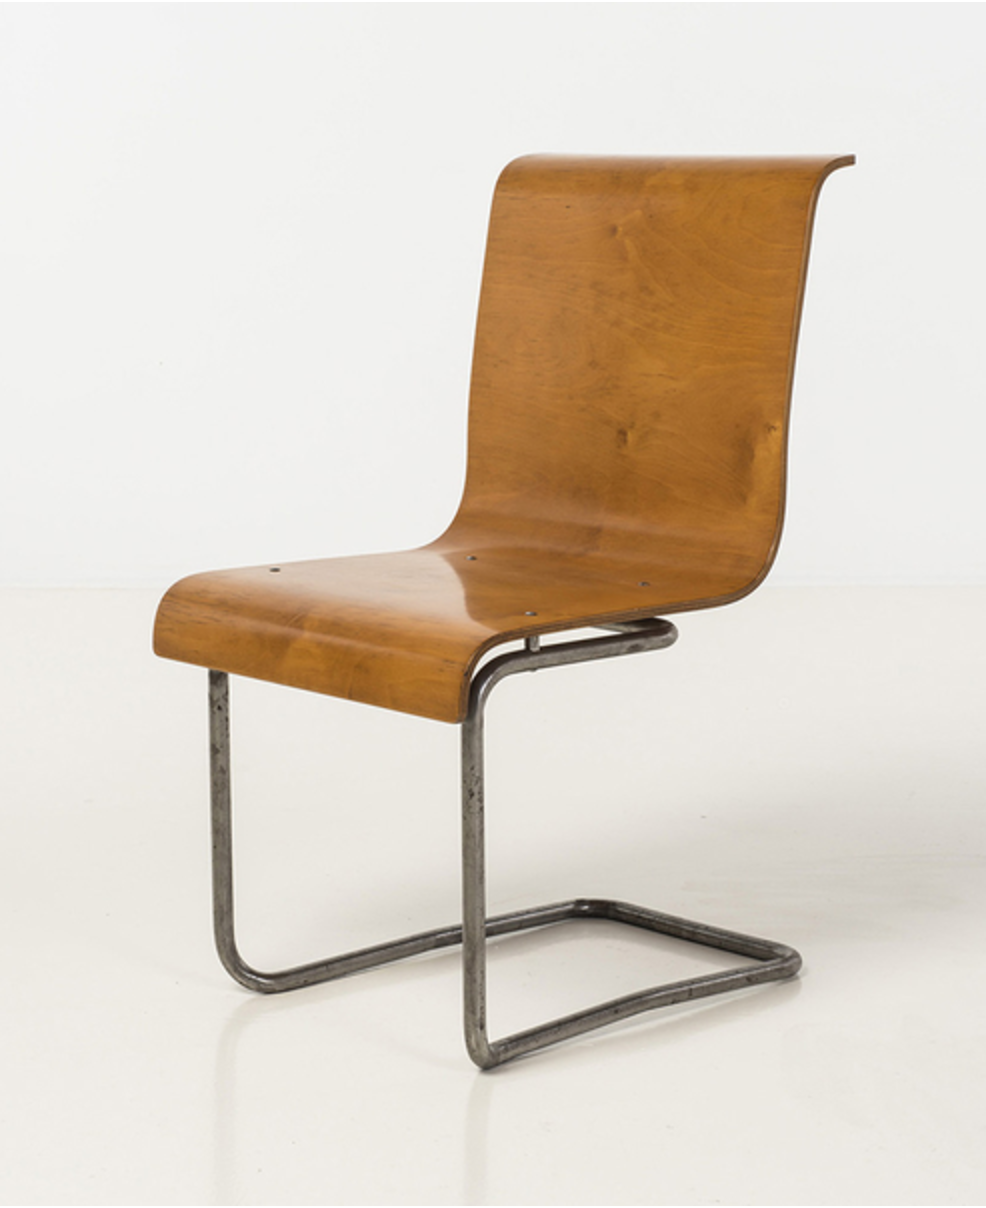 Alvar Aalto Chaise N 176 23 1930 Objets Furniture